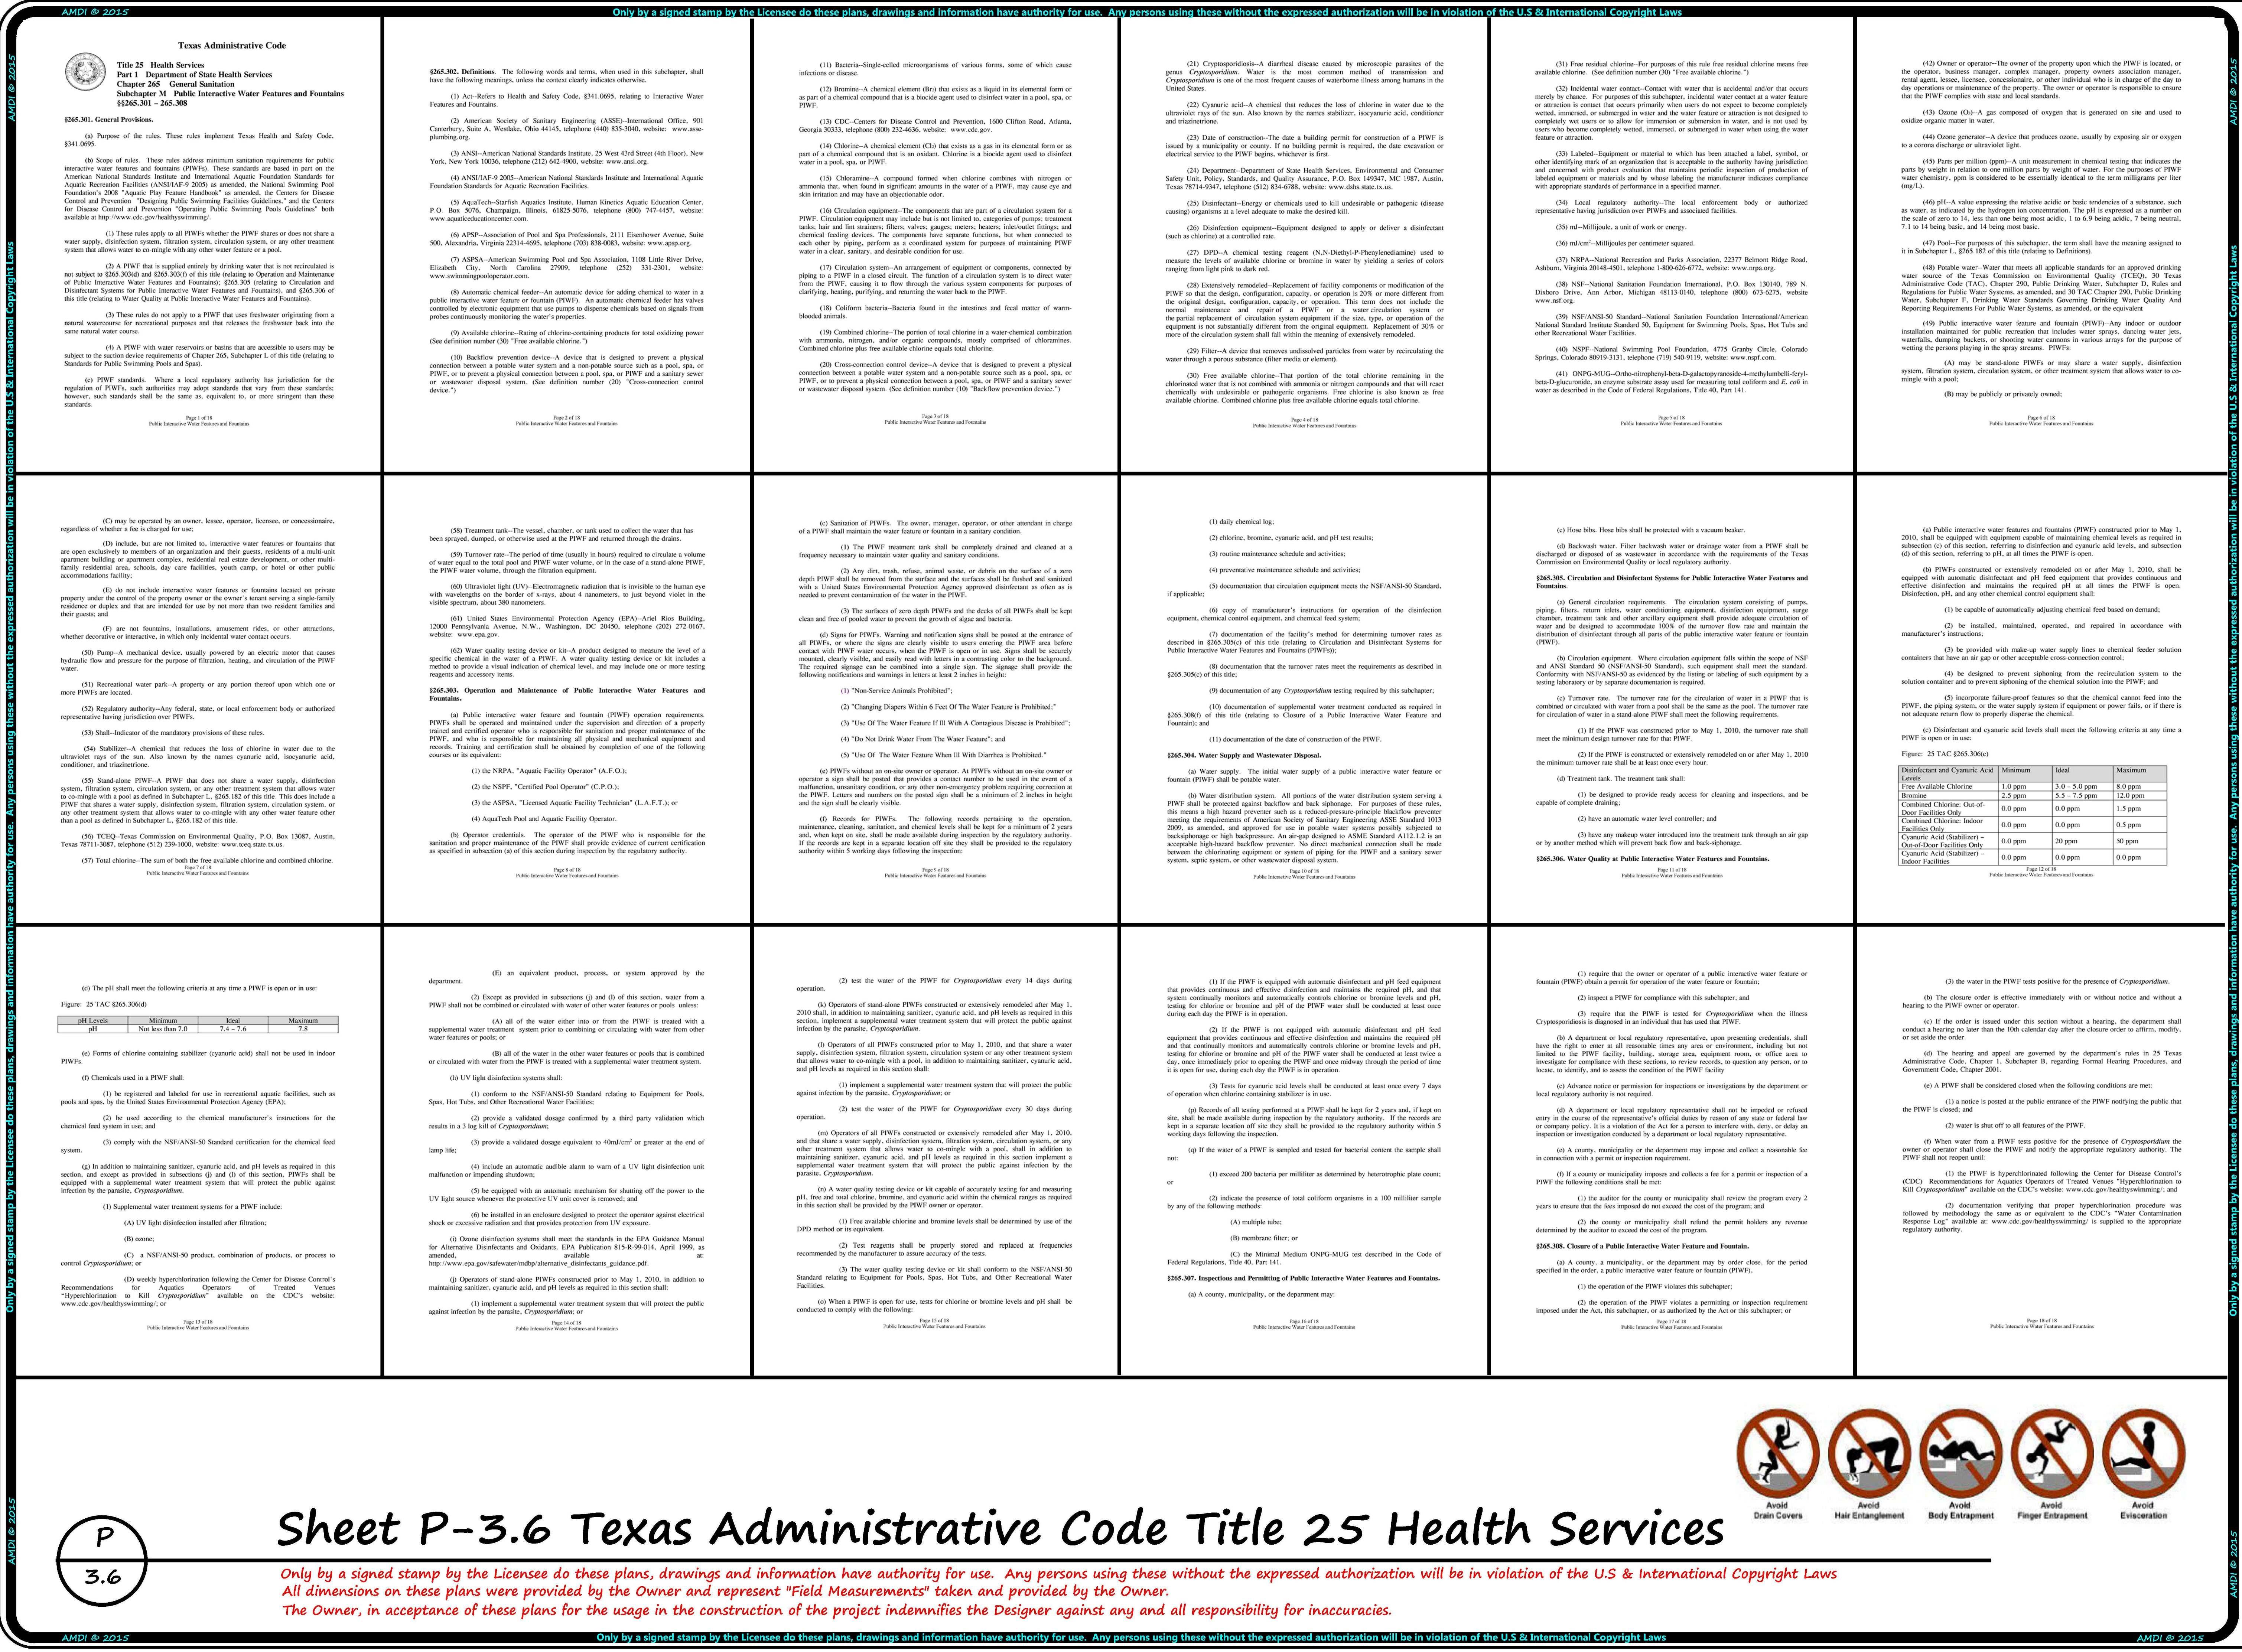 TEXAS ADMINISTRATIVE CODE TITLE 25 Pg. 1 thru 18